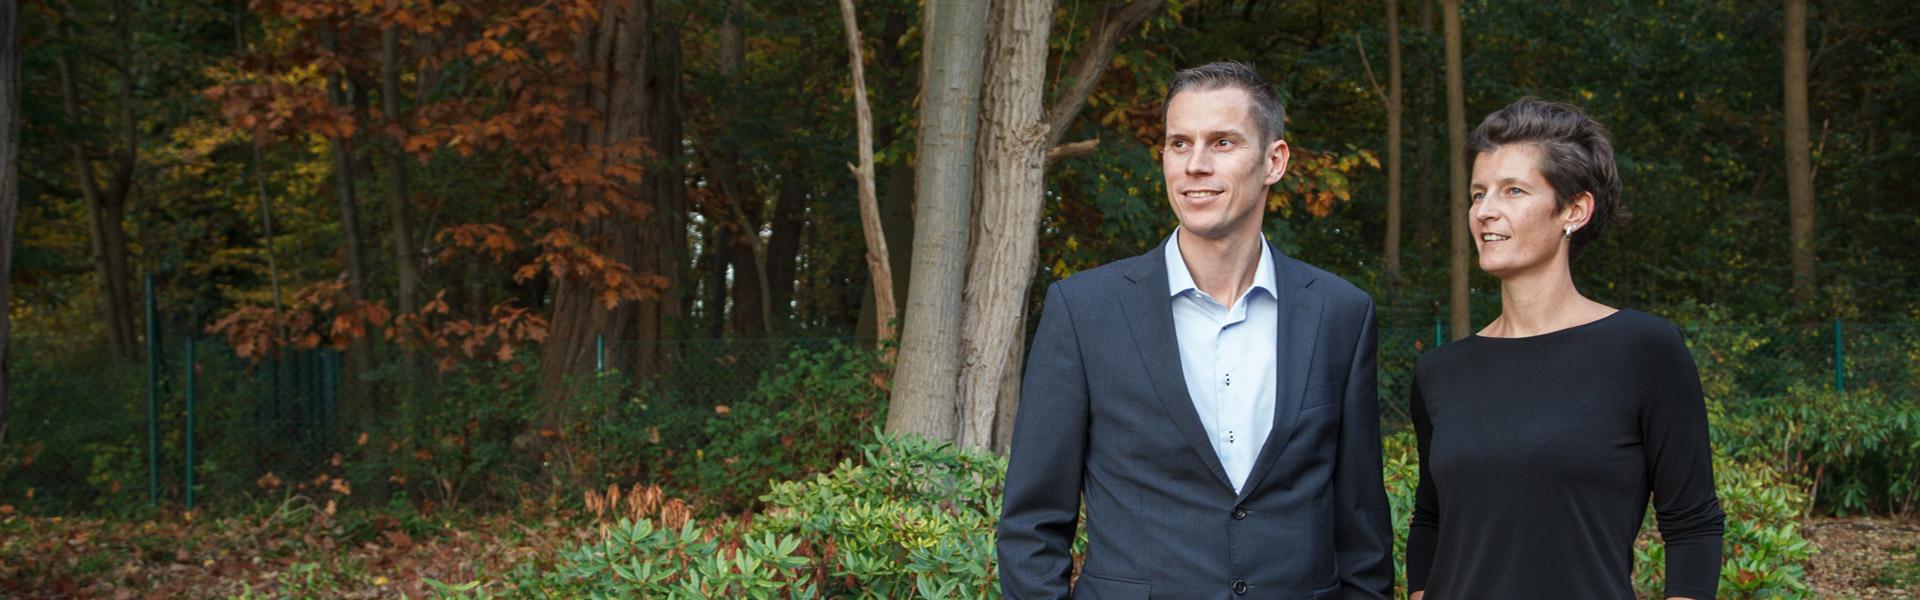 Conundra Founders: Steven De Schrijver and An De Wispelaere